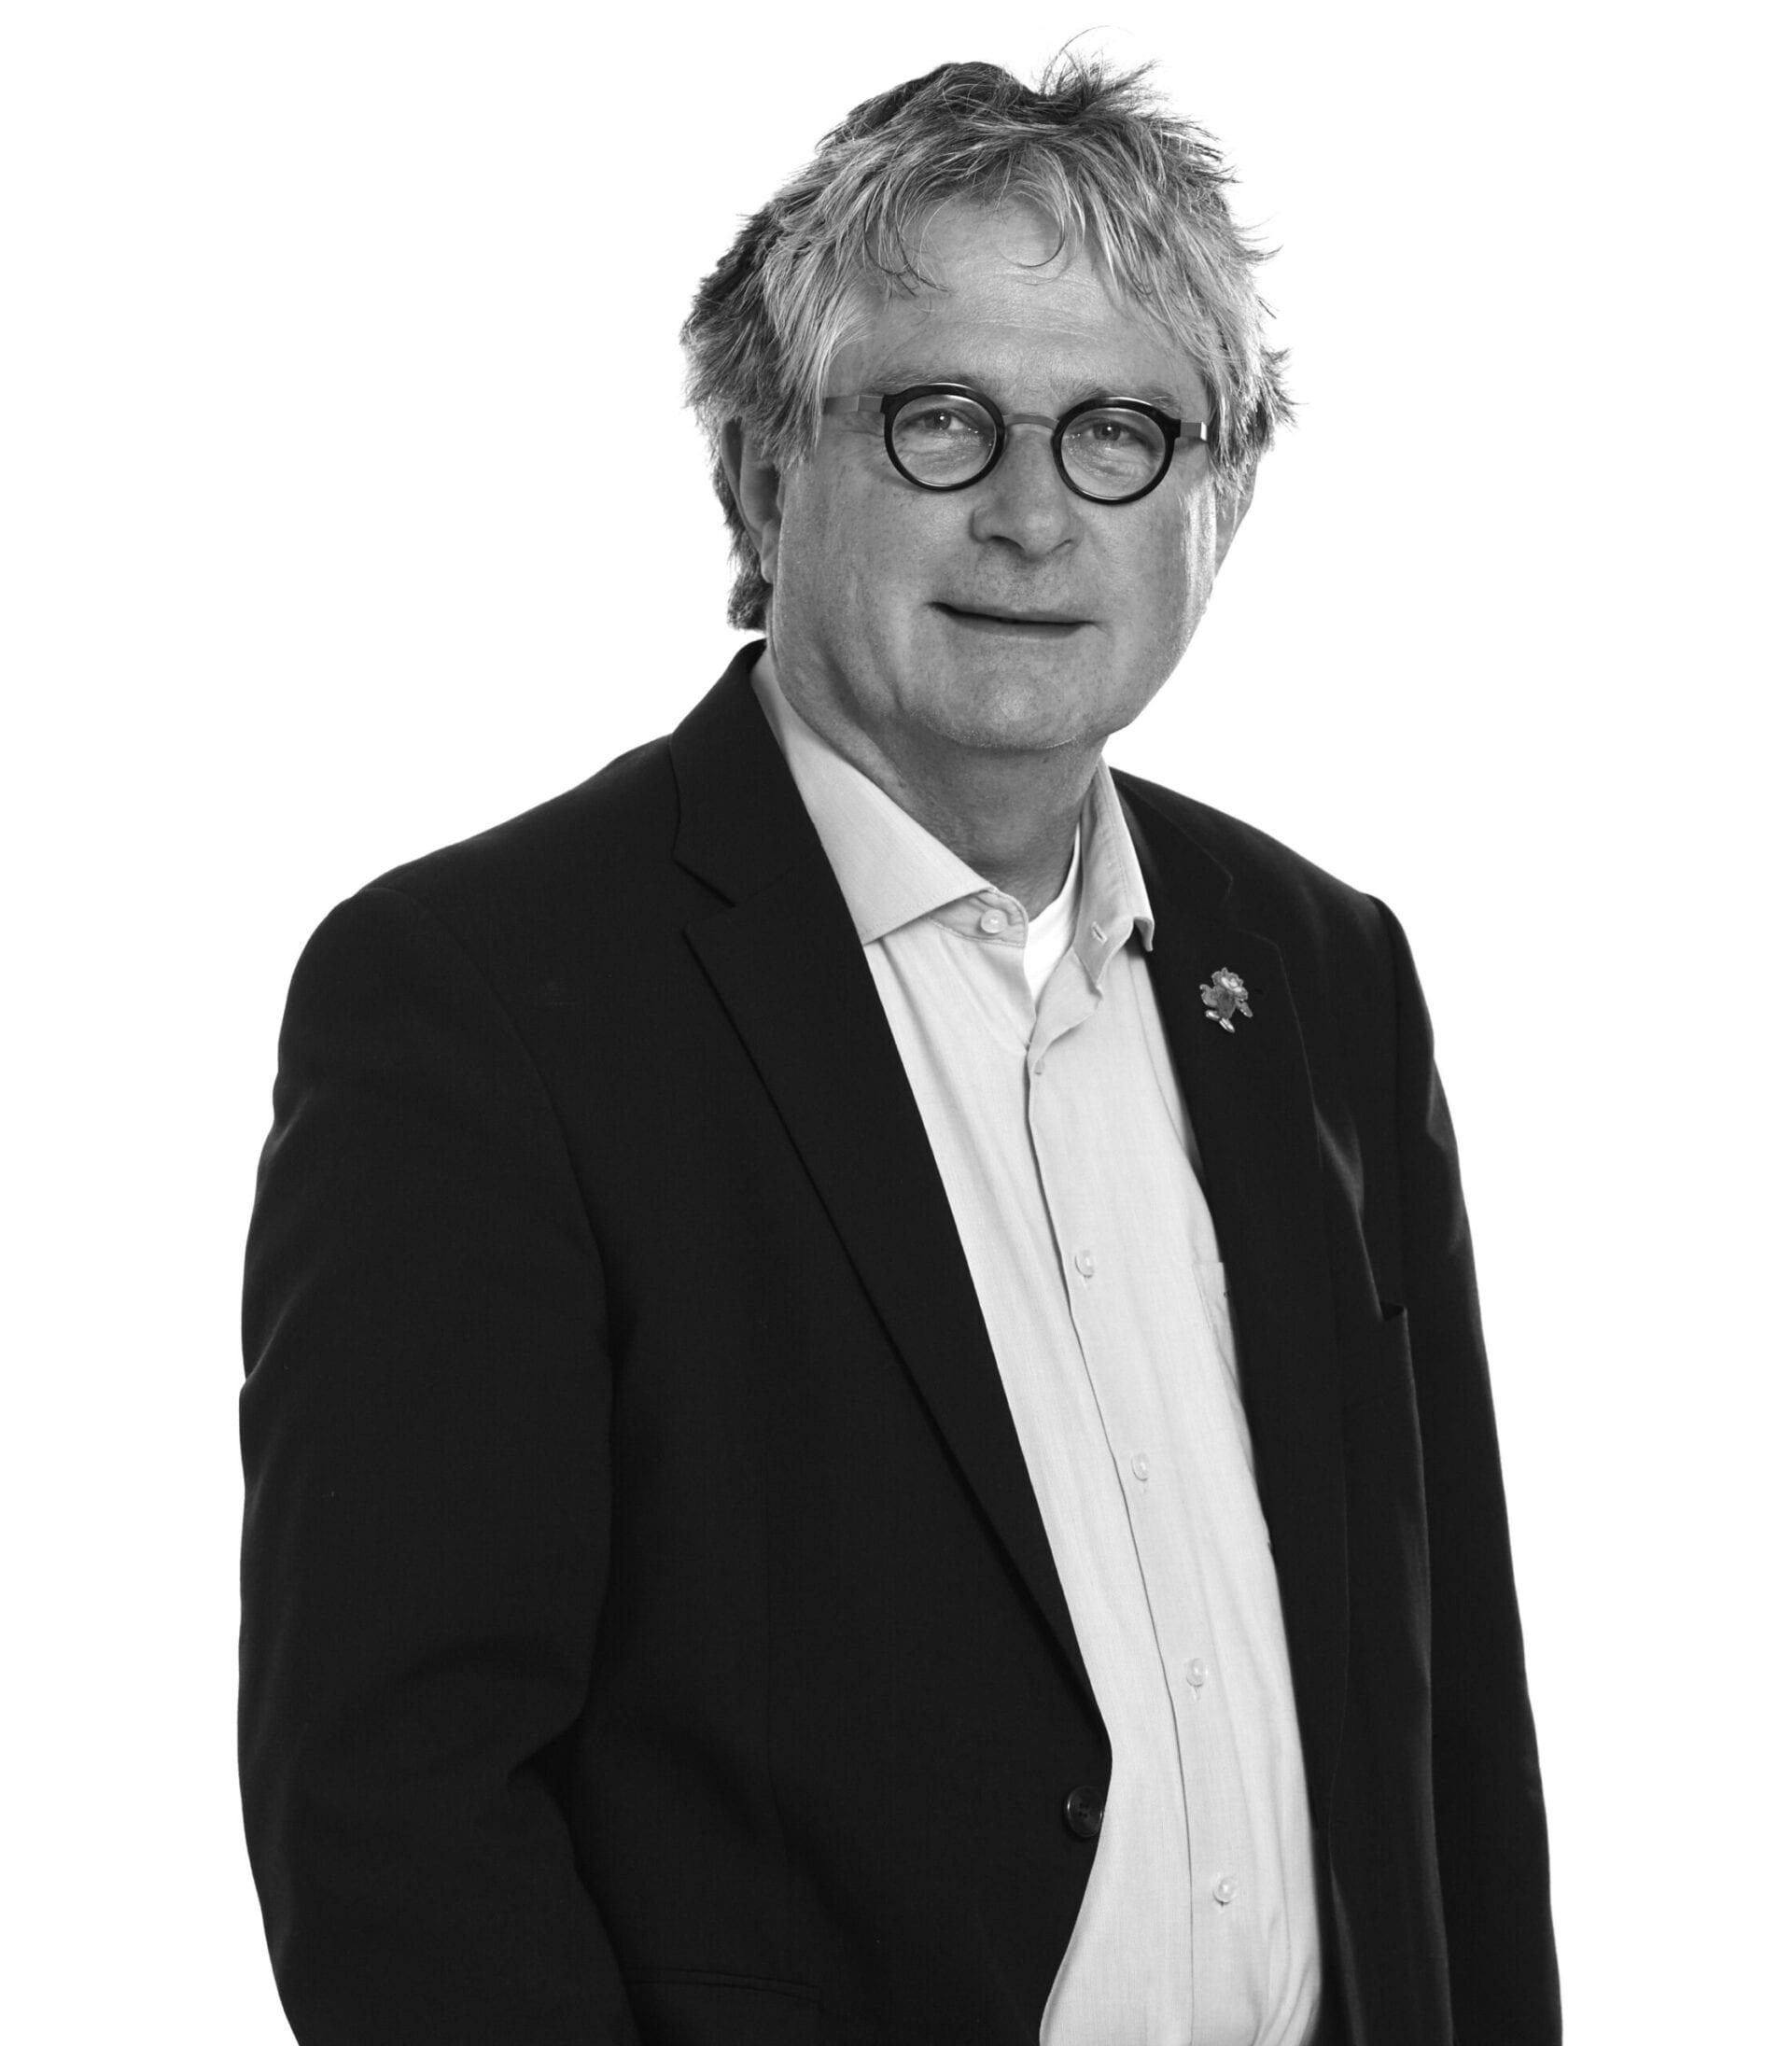 Matthias Plewa